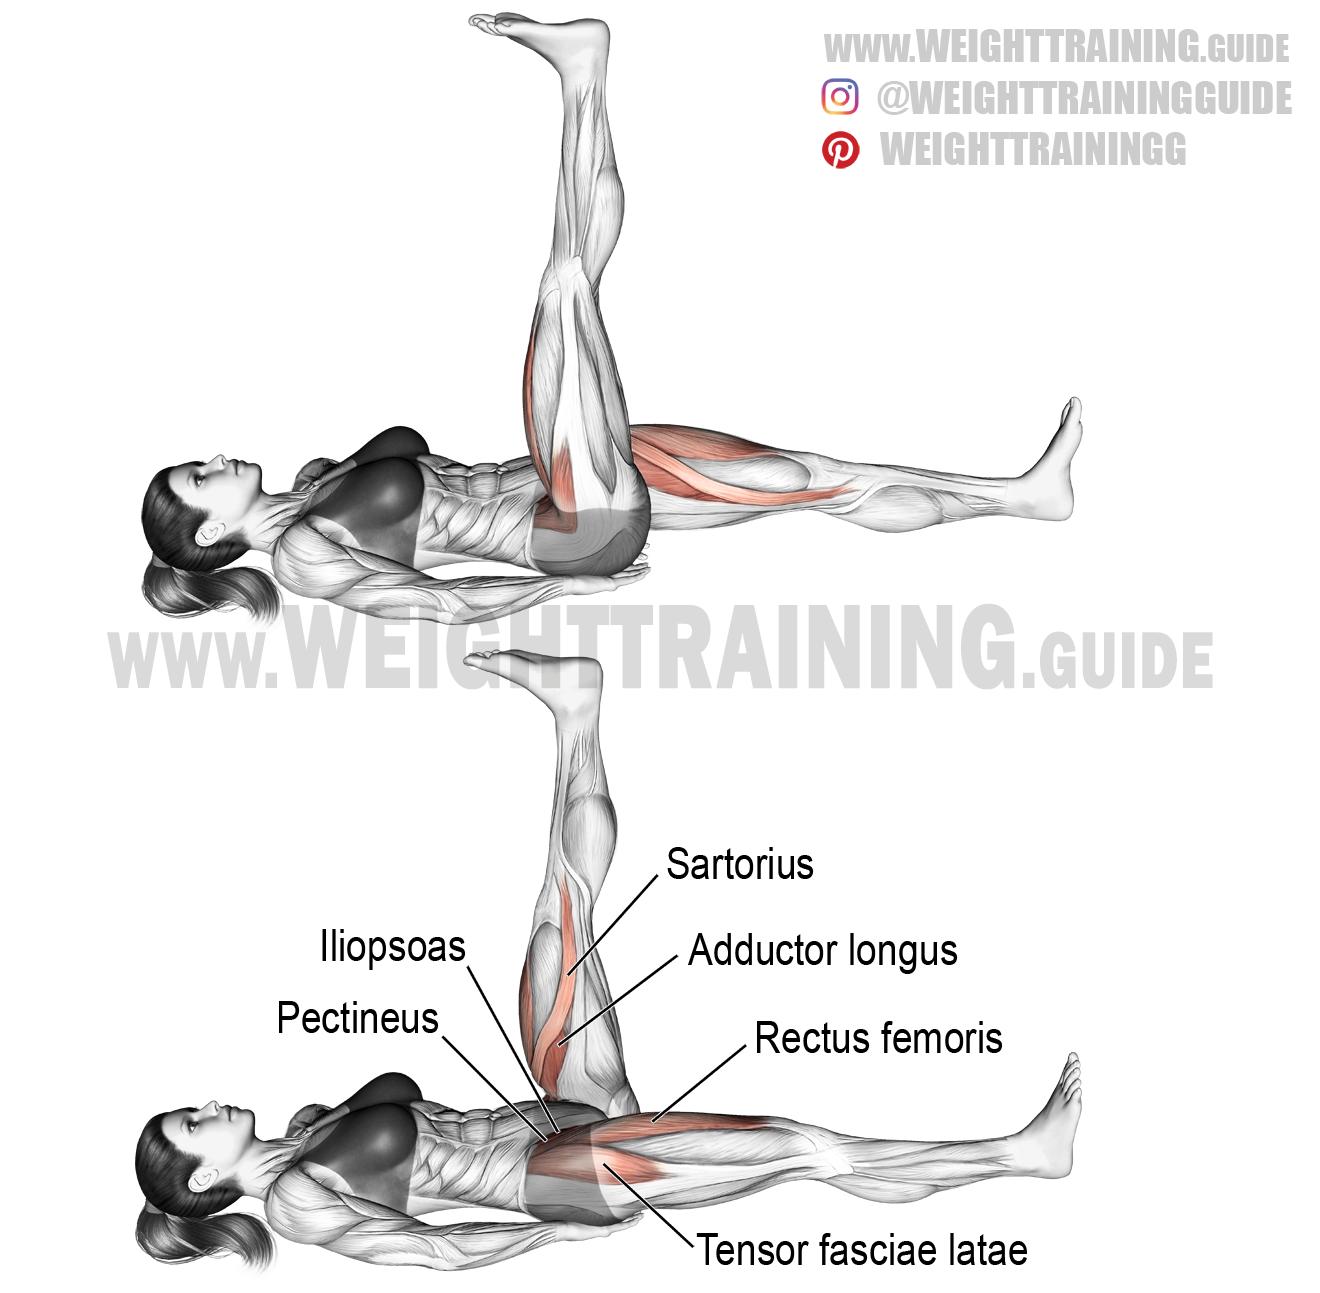 Lying Alternating Leg Raise Instructions And Video